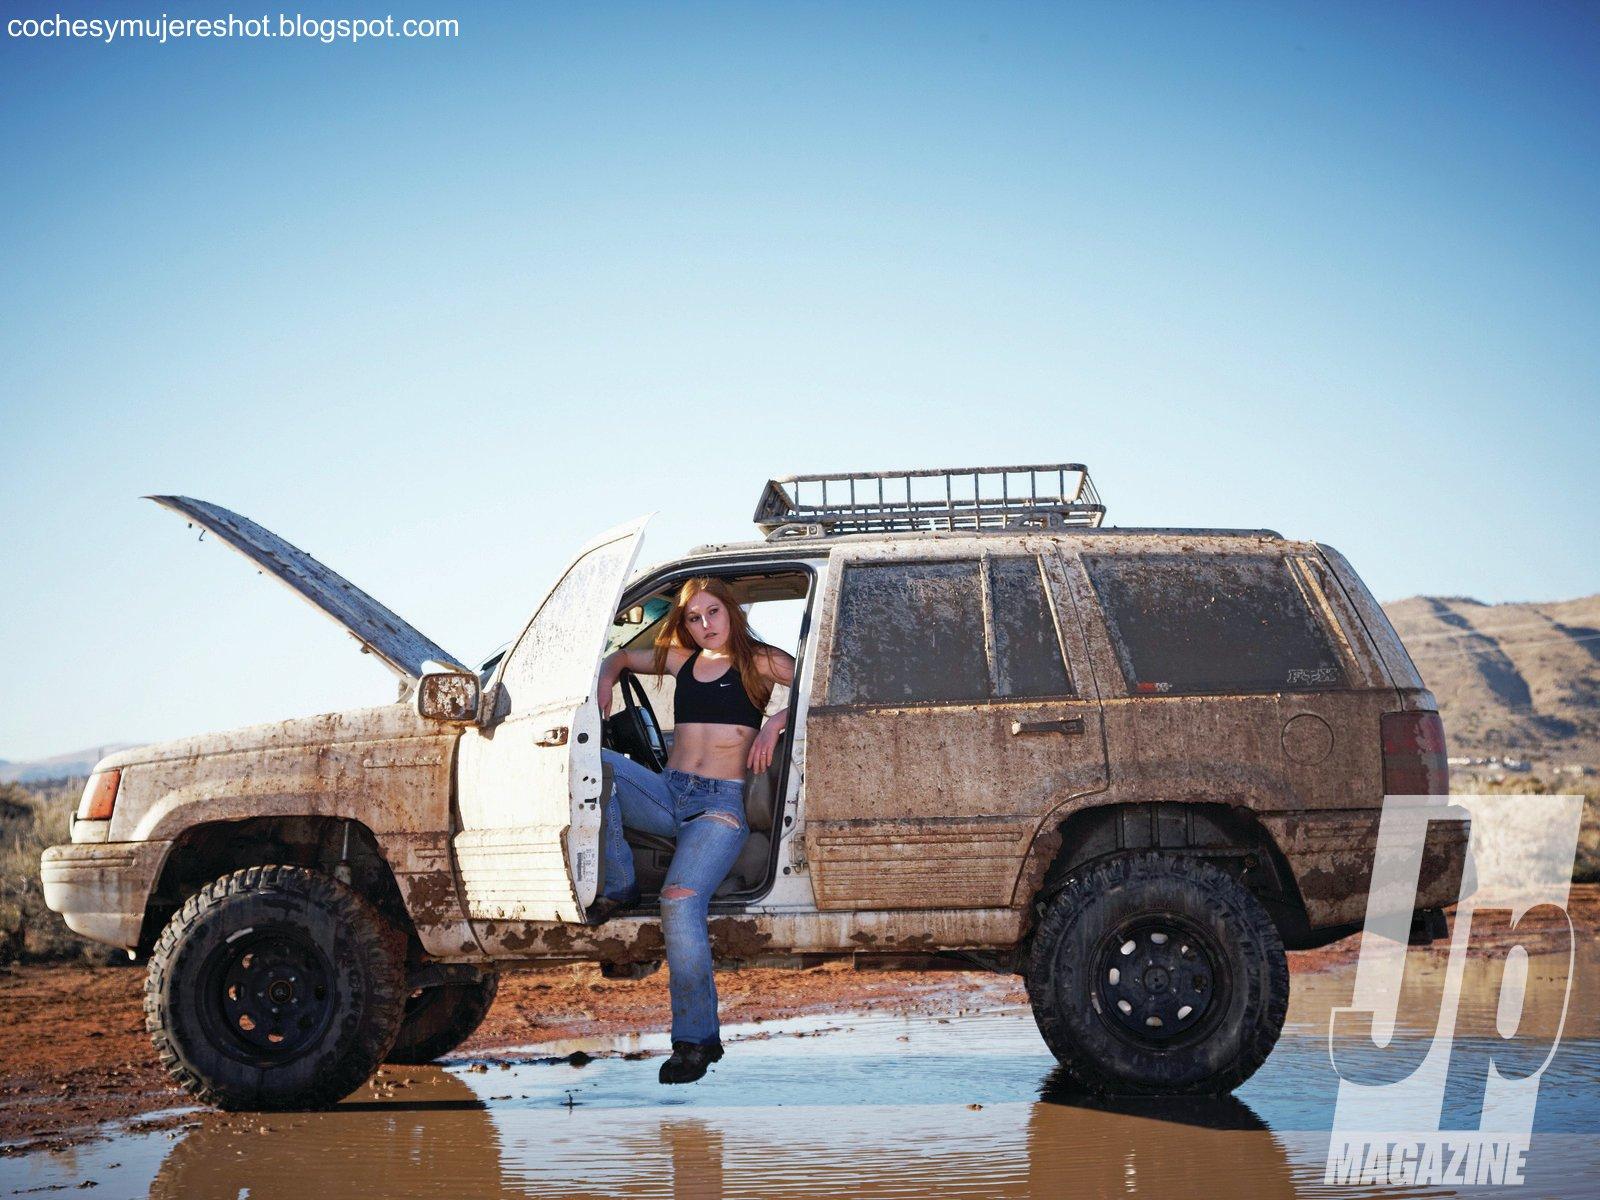 http://1.bp.blogspot.com/-QpkYf_5lOUE/T097gCXL6NI/AAAAAAAAArw/EXlPnJvWR9s/s1600/girl-grand-cherokee-jeep-4x4-camioneta-lodo-carro-chavas-hd-wallpaper-papel-tapiz-lodo-sucia-548%2B%255Bcochesymujereshot.blogspot.com%255D.jpg